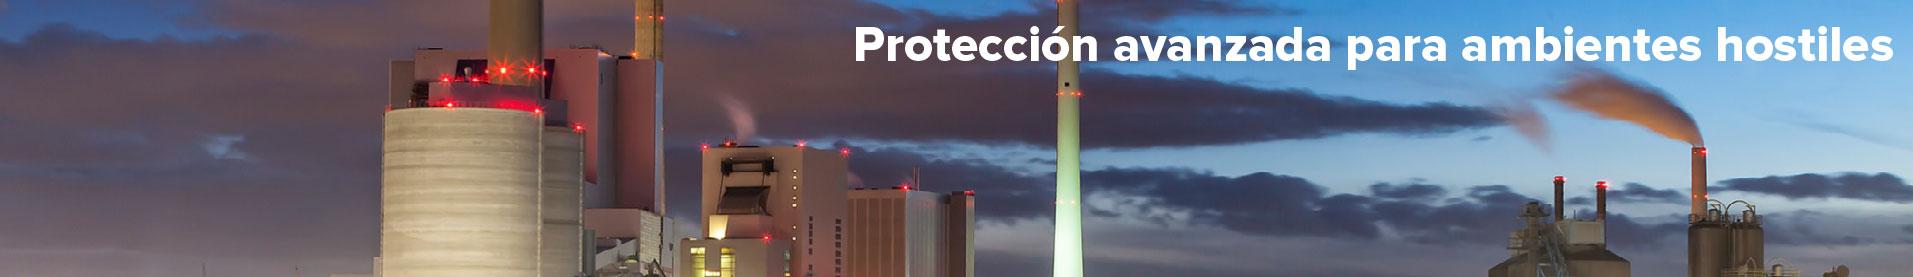 proteccion avanzada zulers